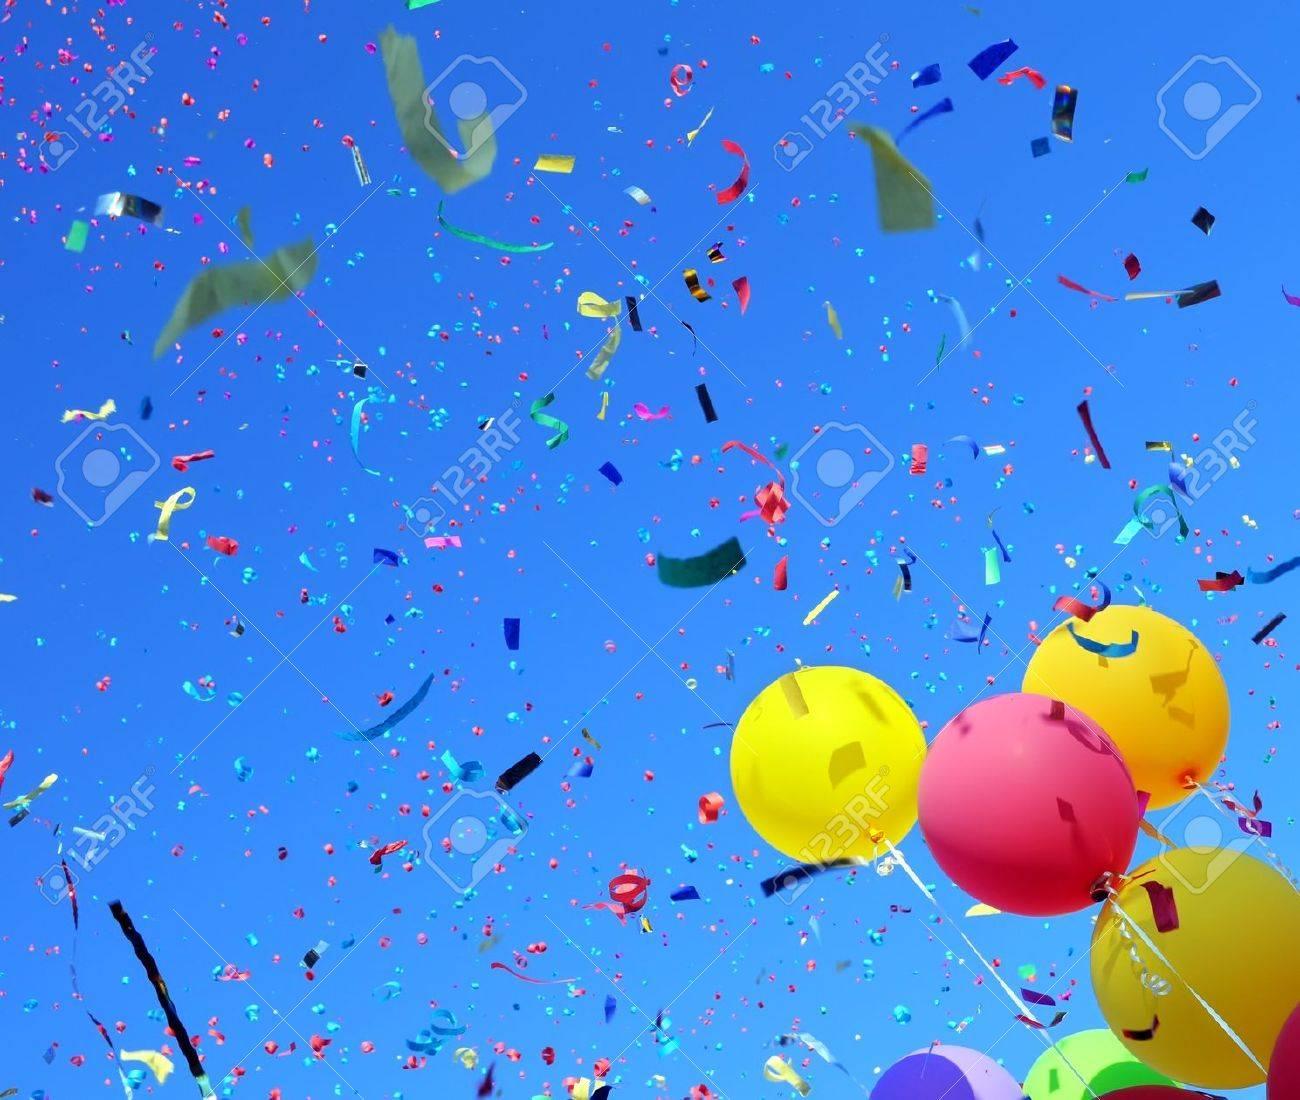 multicolored balloons and confetti in the city festival #3 Stock Photo - 16110120